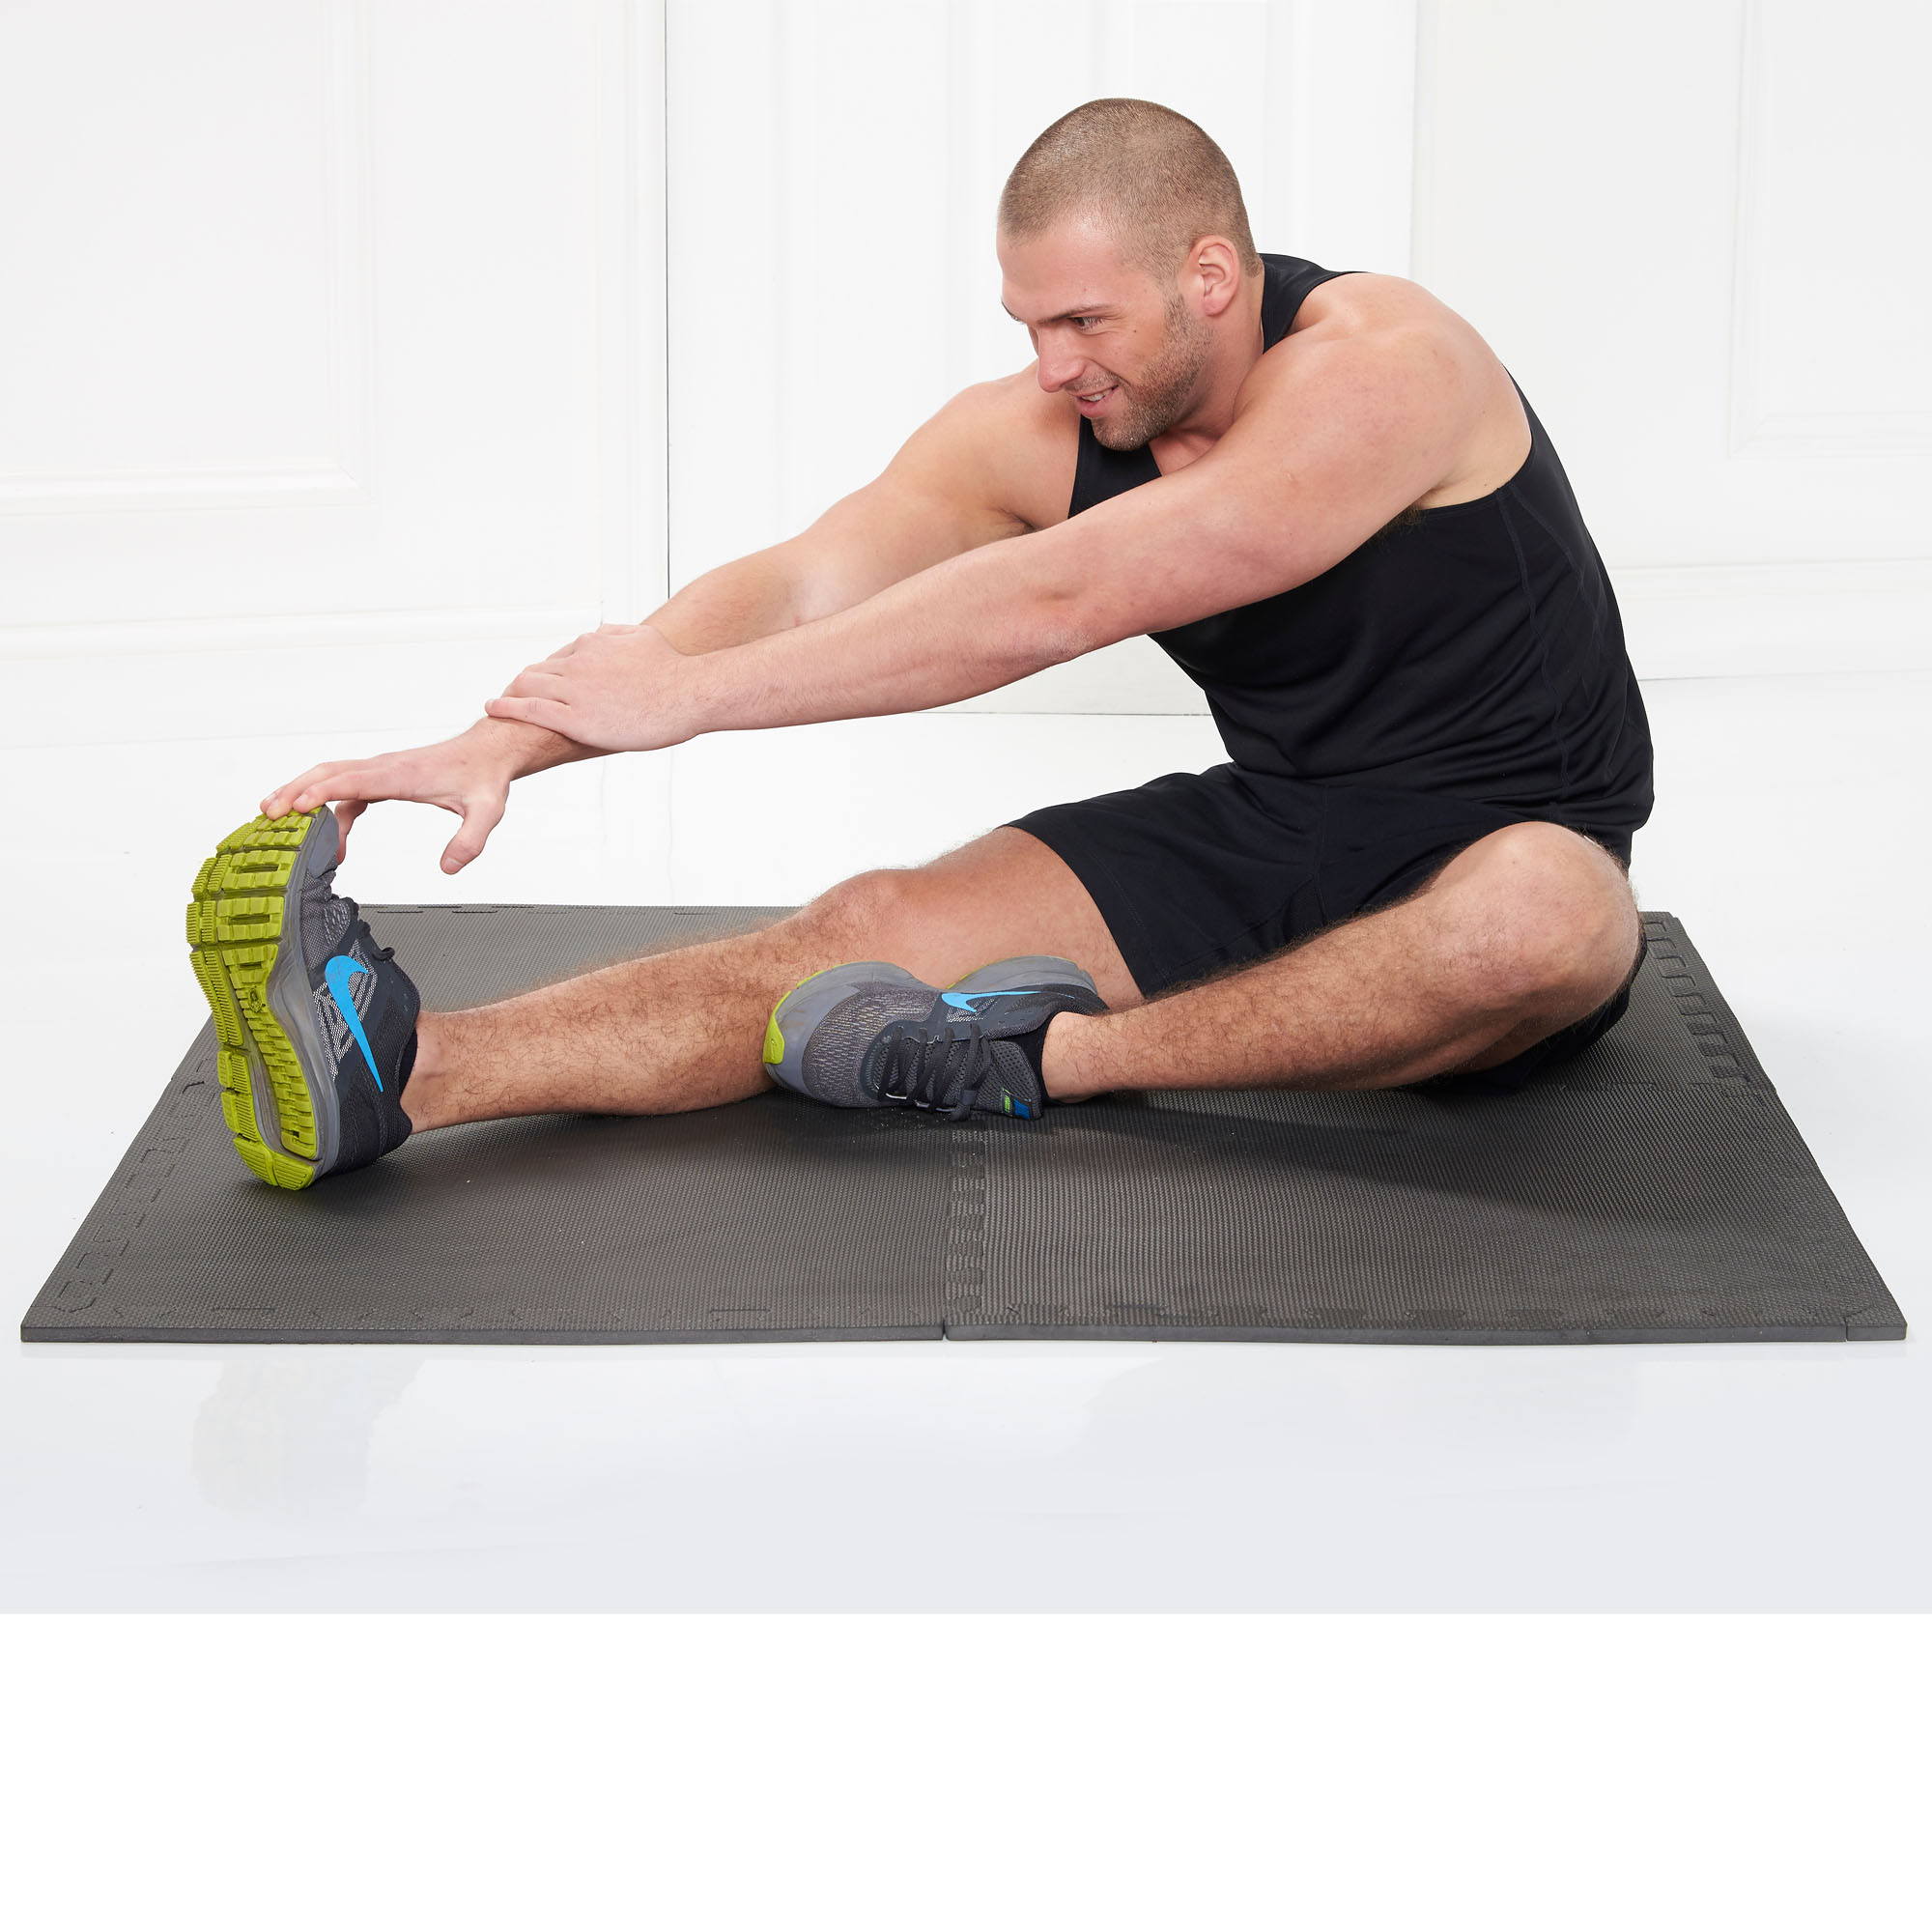 Gym Equipment Gold Coast: Gold Coast Interlocking Gym Floor Mats Thick EVA Foam 16